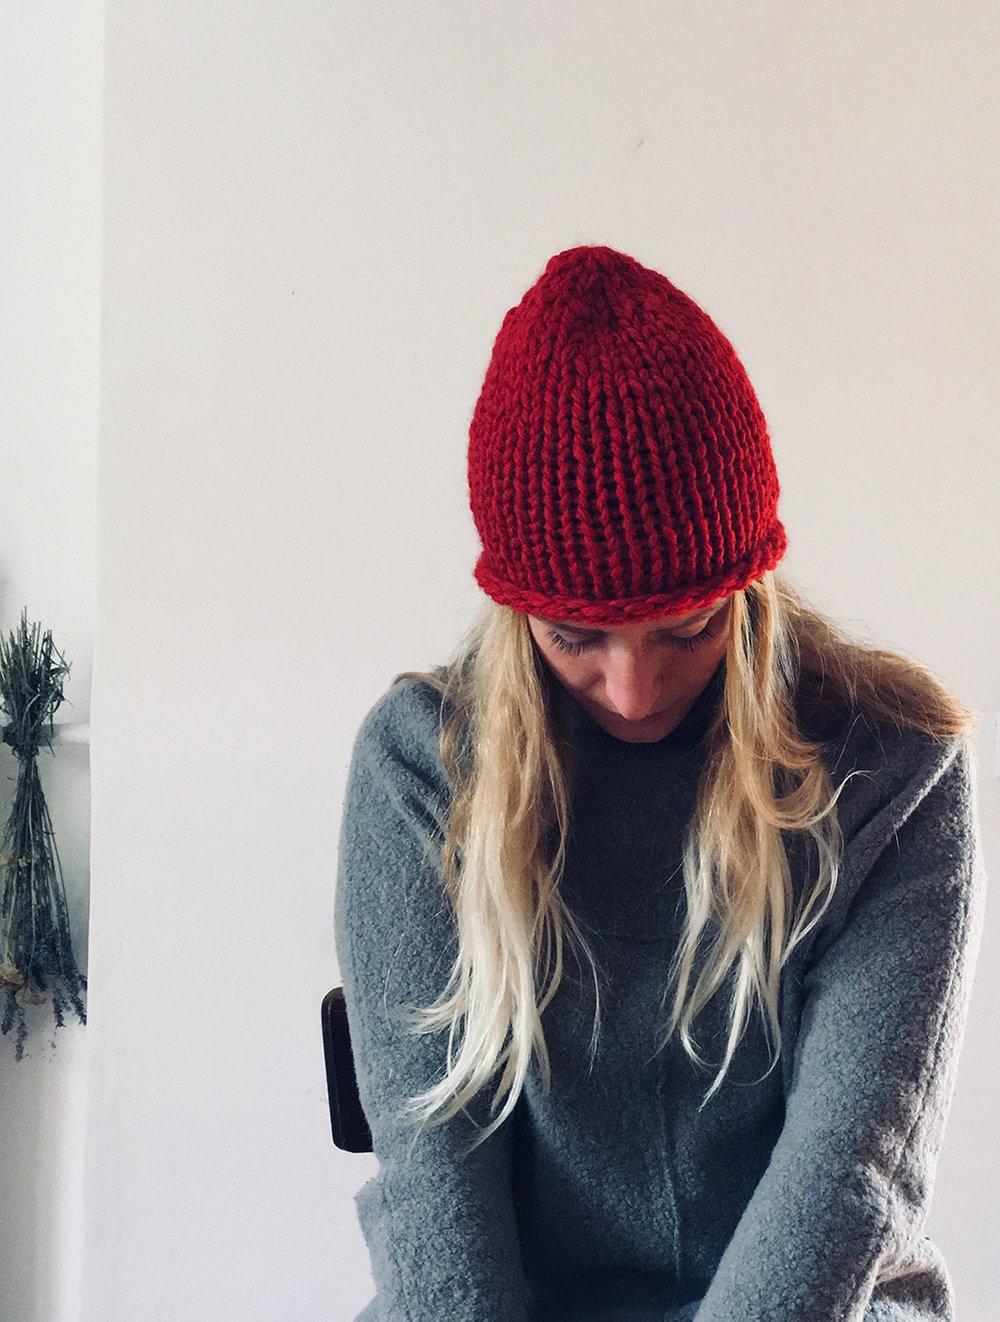 wool_done_jo_beanie_knitting_kit.jpg